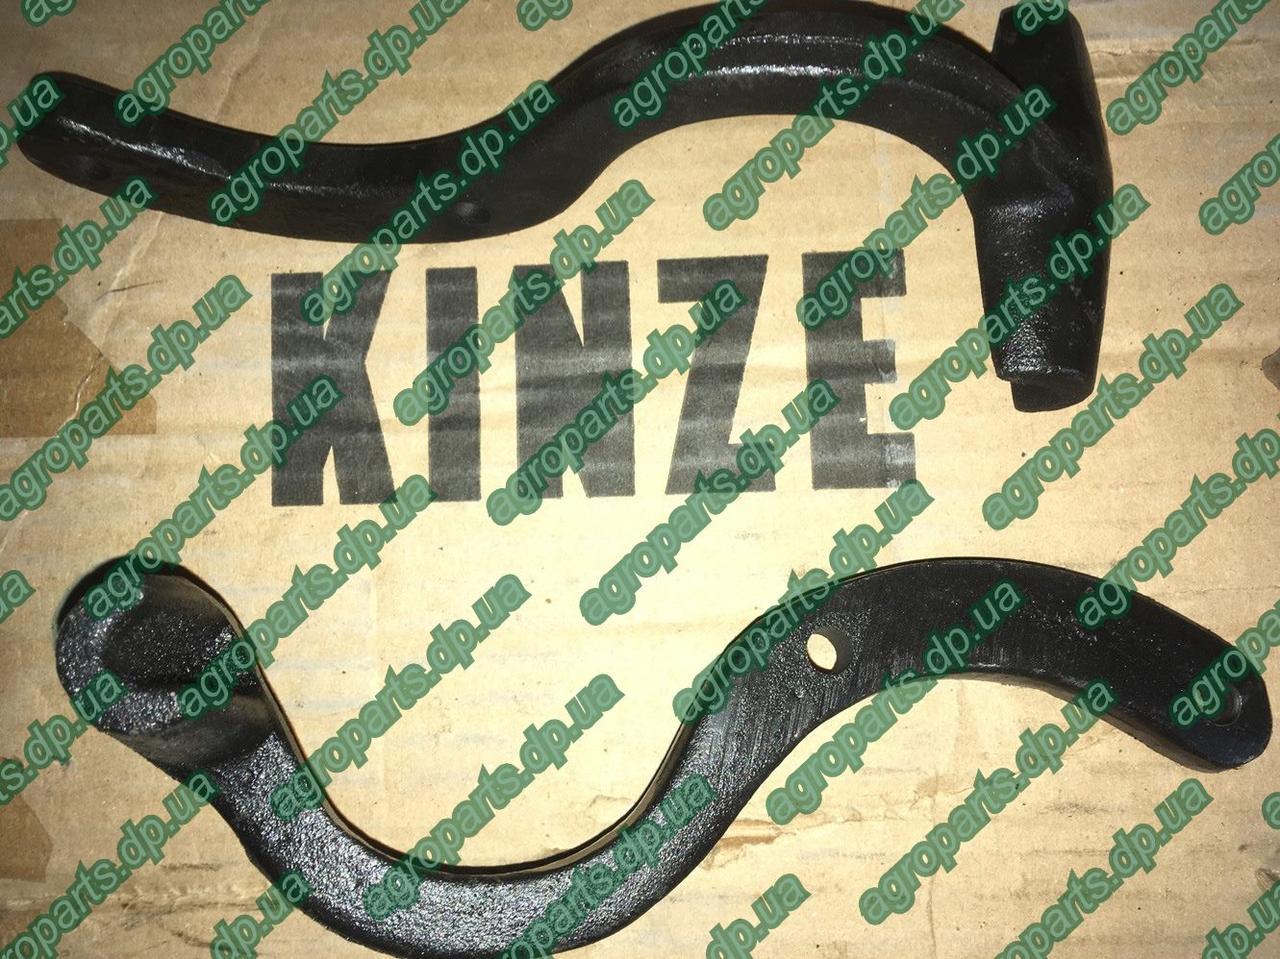 Рычаг GB0215 прикат. колеса HANDLE Kinze GB0254 з/ч ручка А59806 Lever регулятор